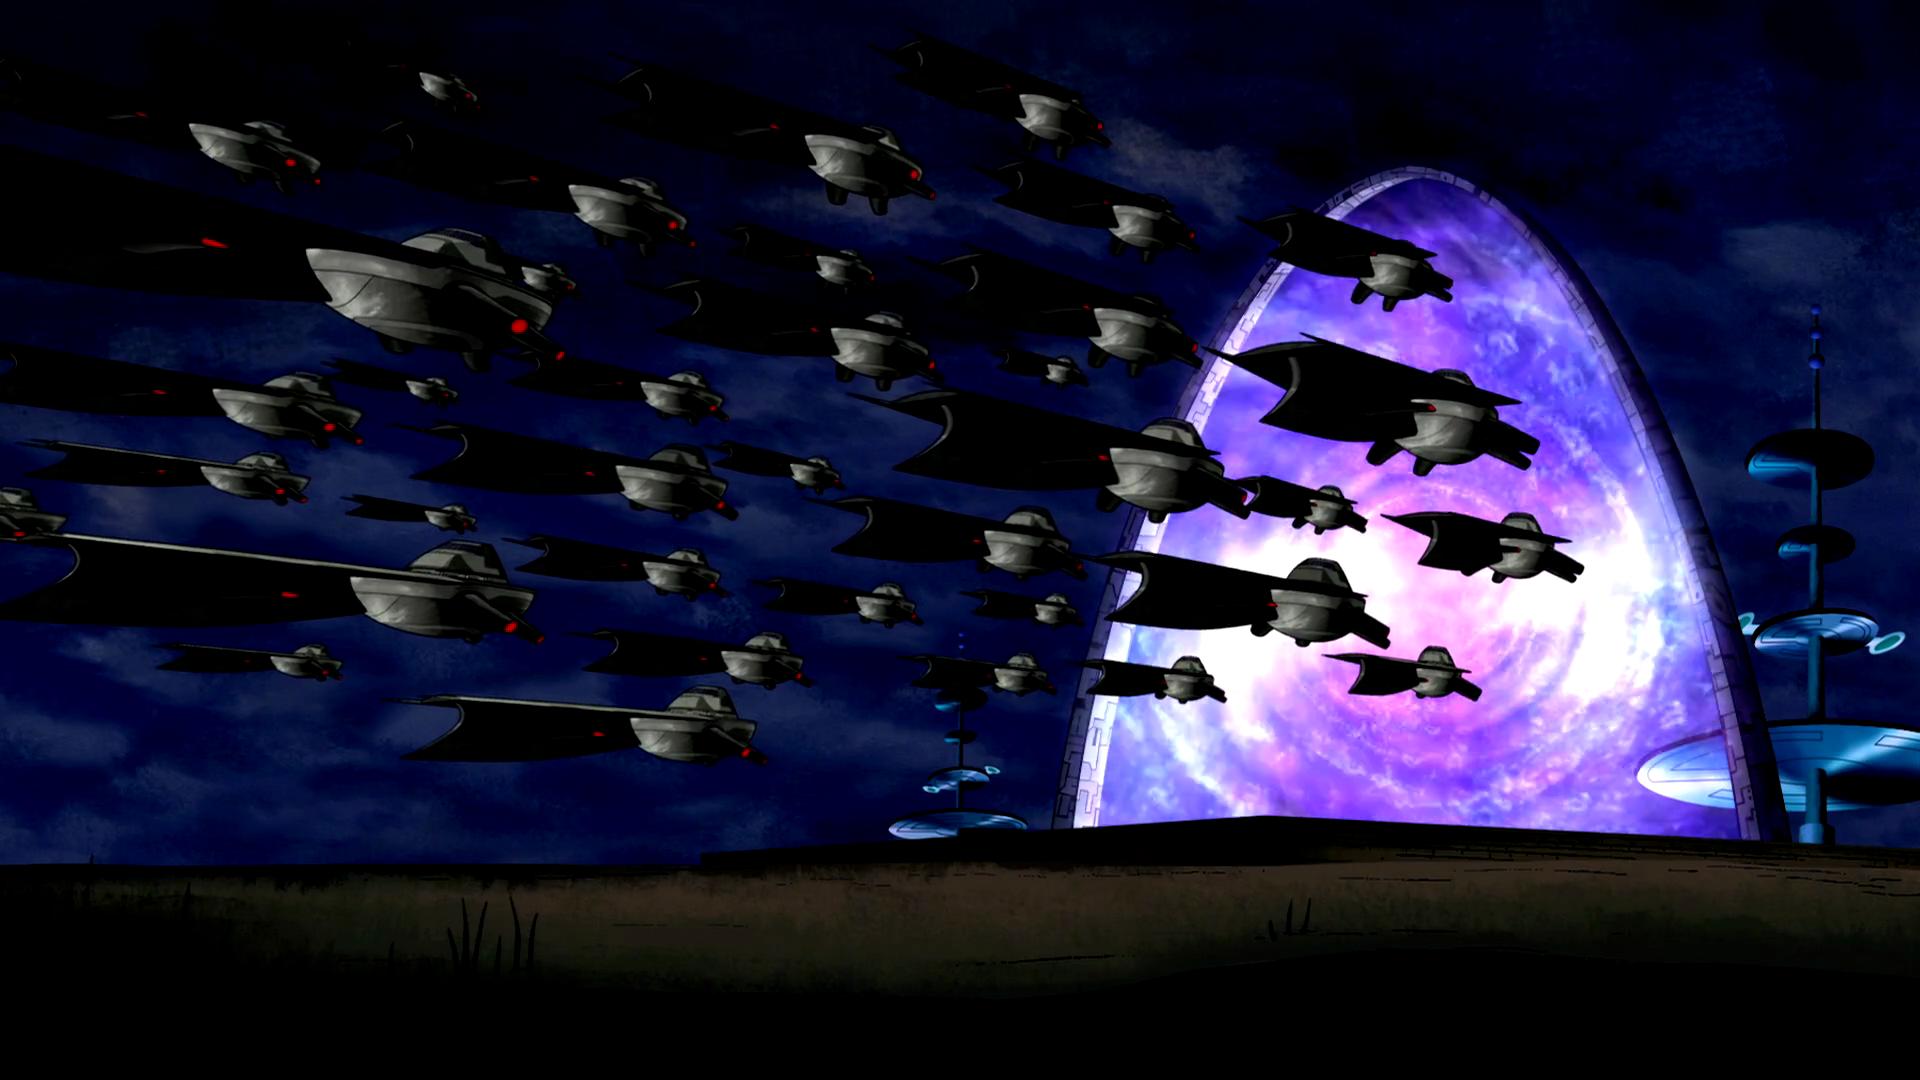 Impressionnant Dessin A Imprimer Gratuit Ben 10 Alien force